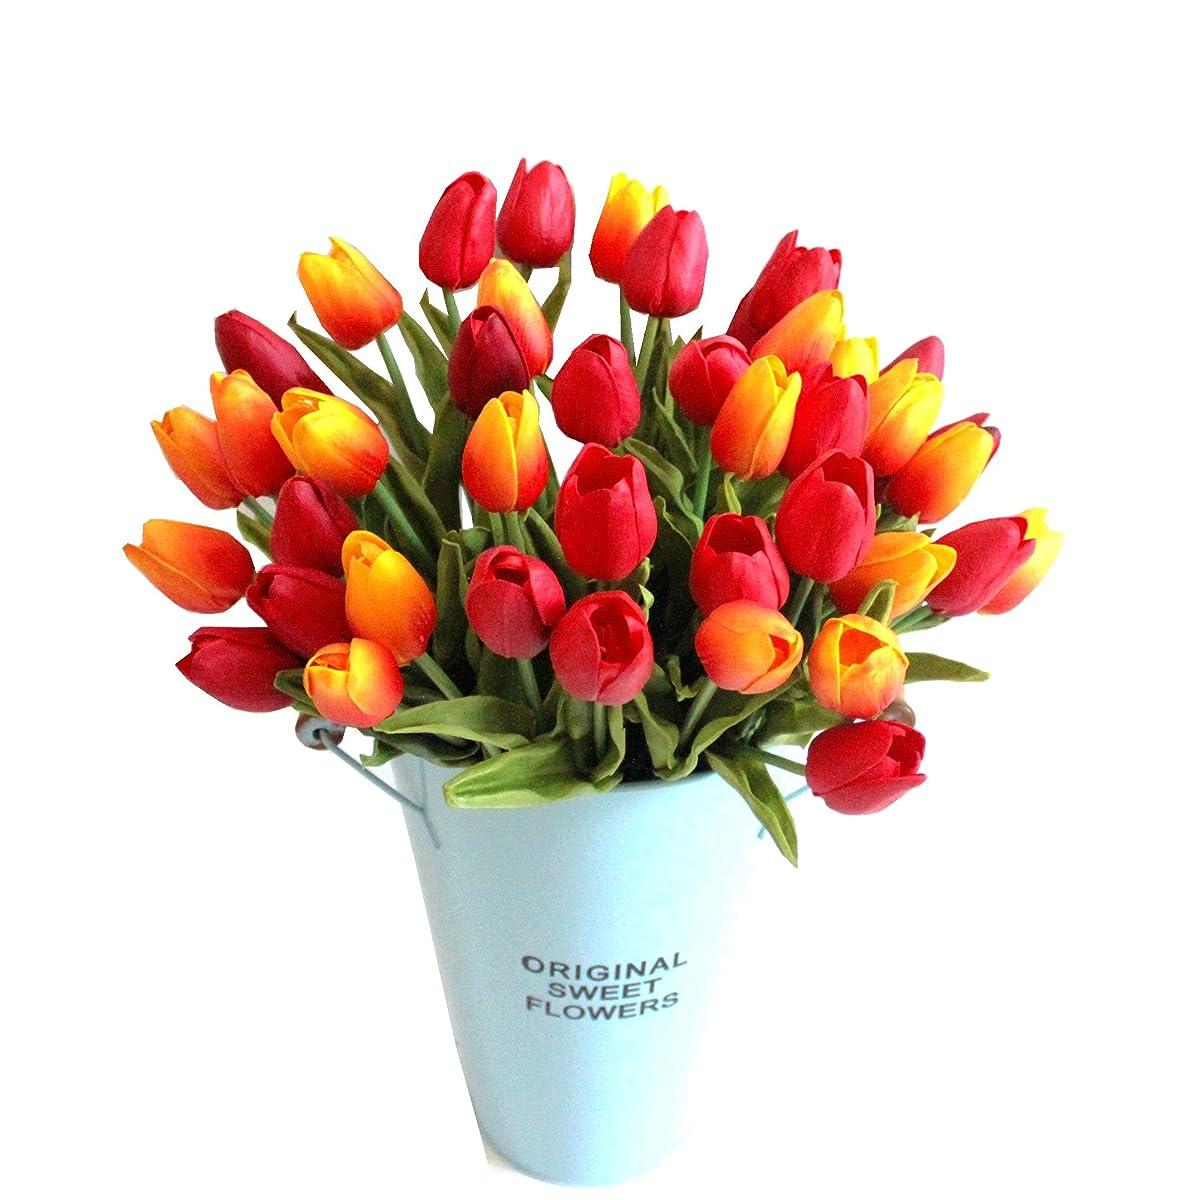 "Mandys 20pcs Orange Artificial Tulip Flowers 14"" for Party Home Wedding Decoration"